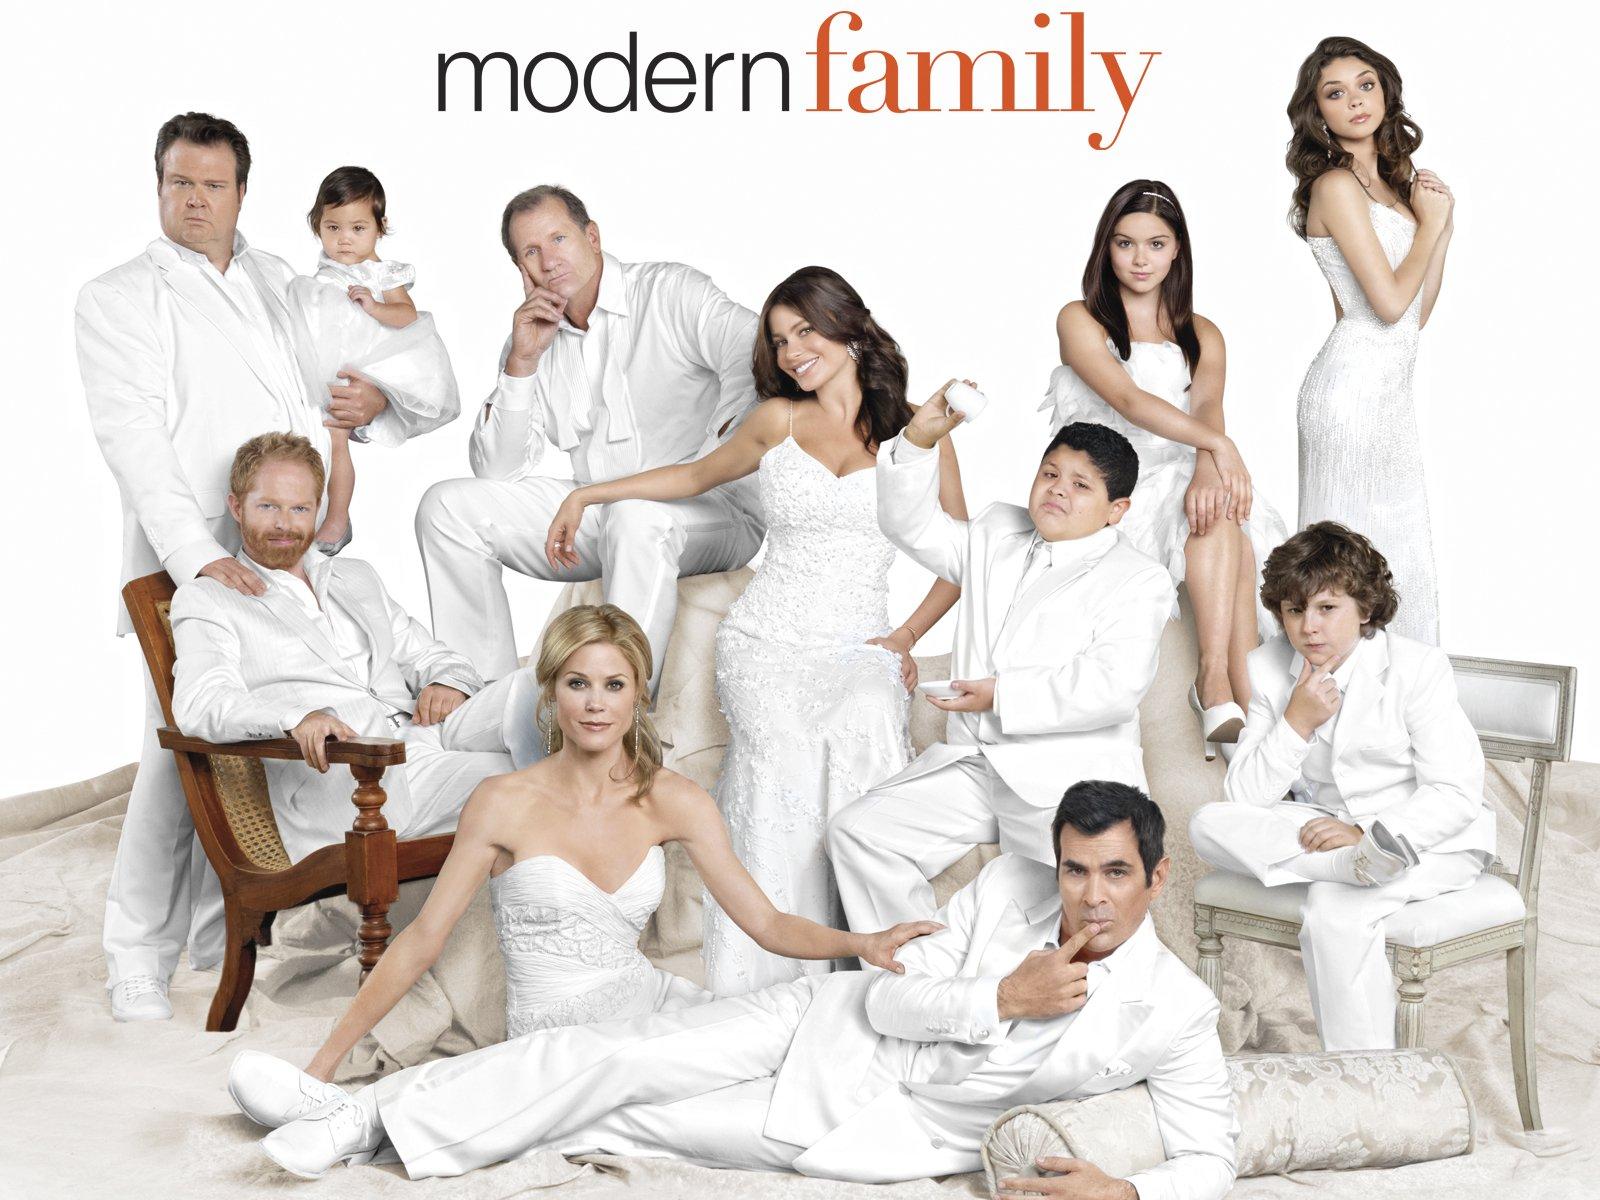 modern family season 10 stream free